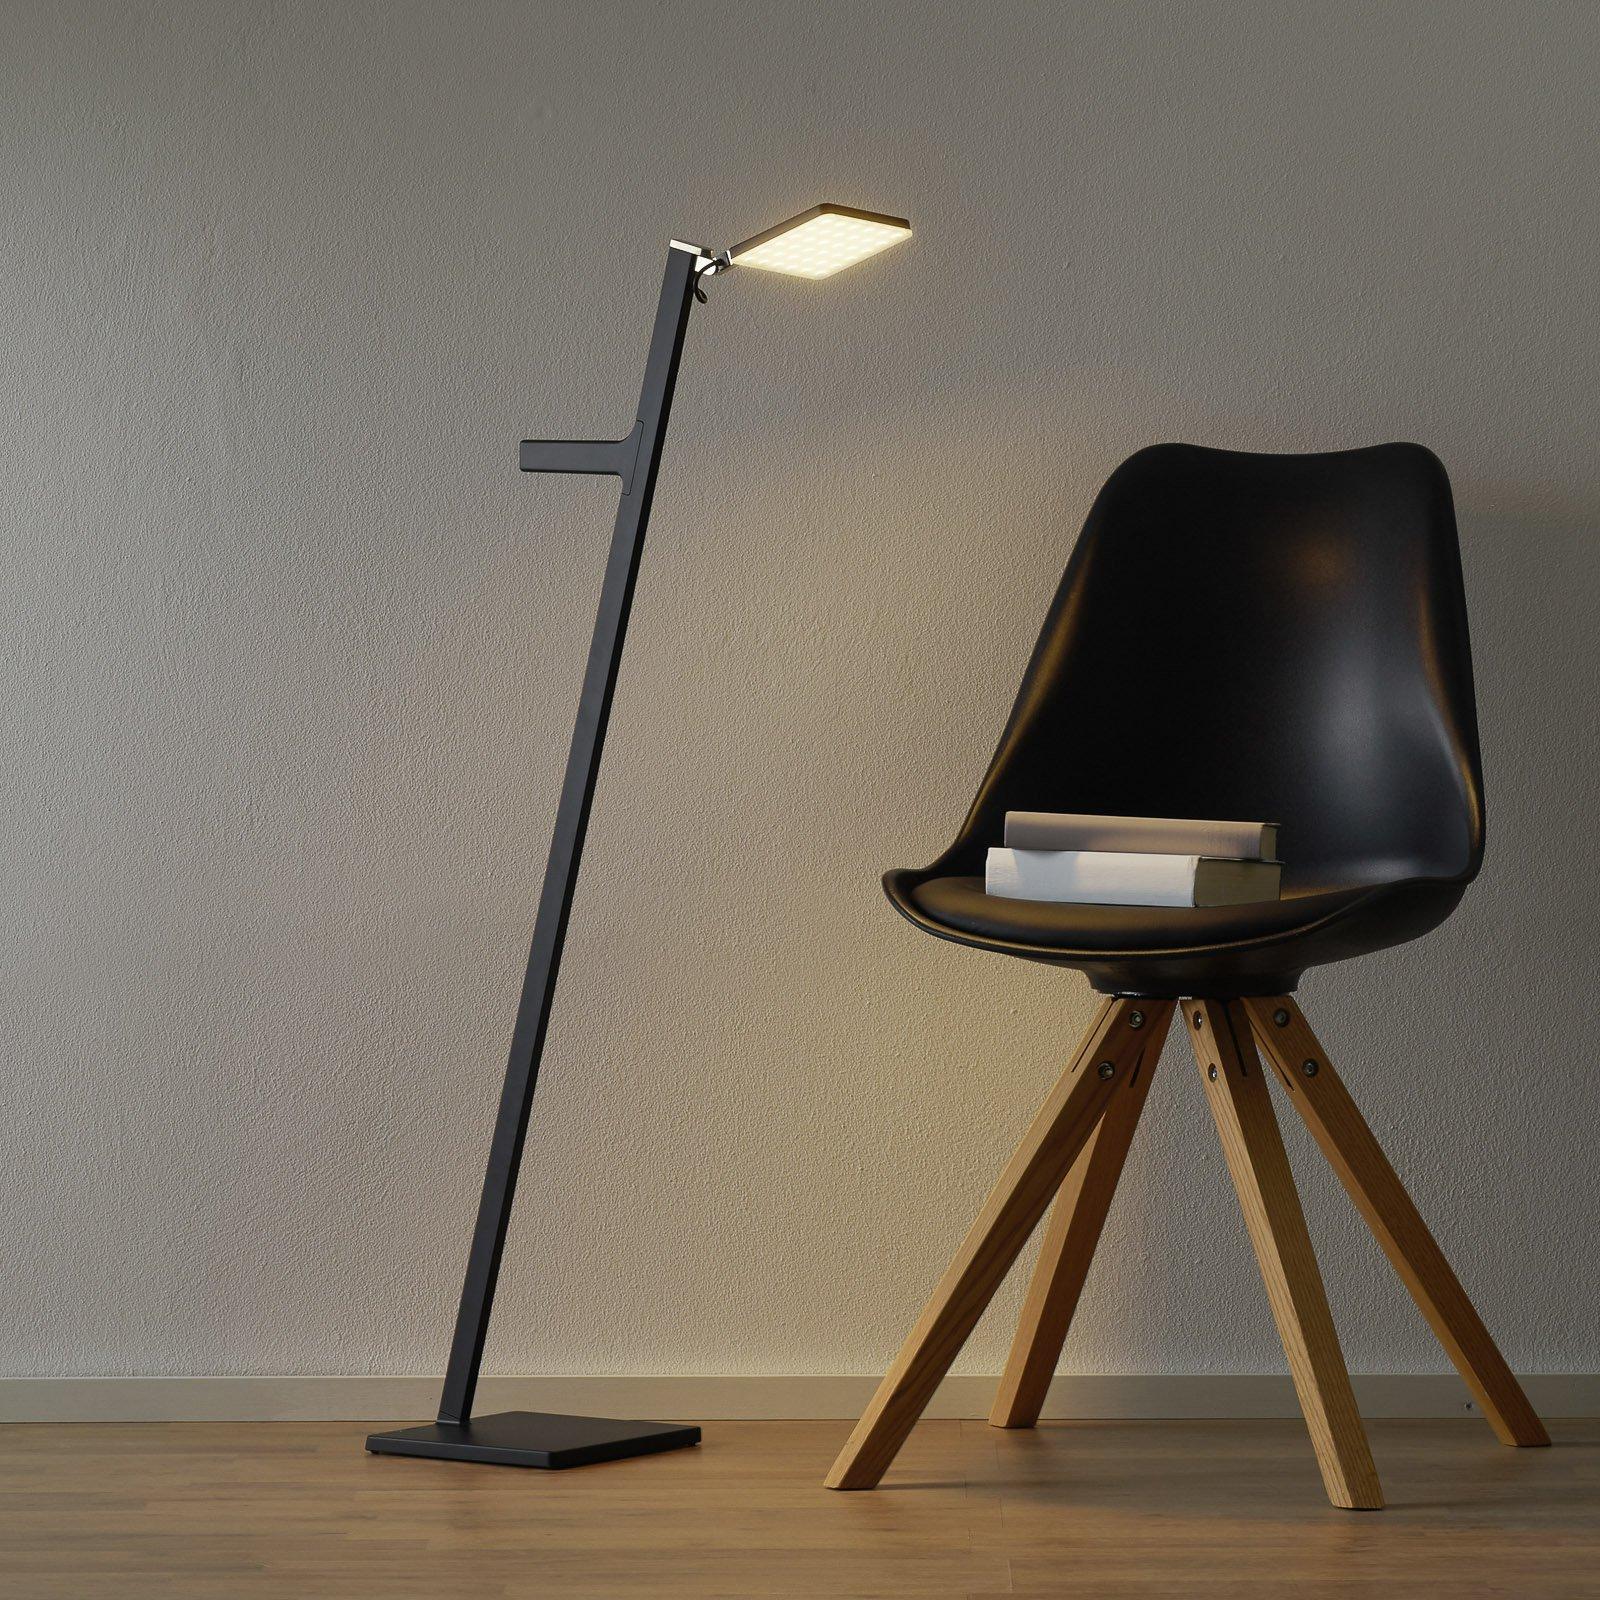 Nimbus Roxxane Leggera LED-gulvlampe, svart